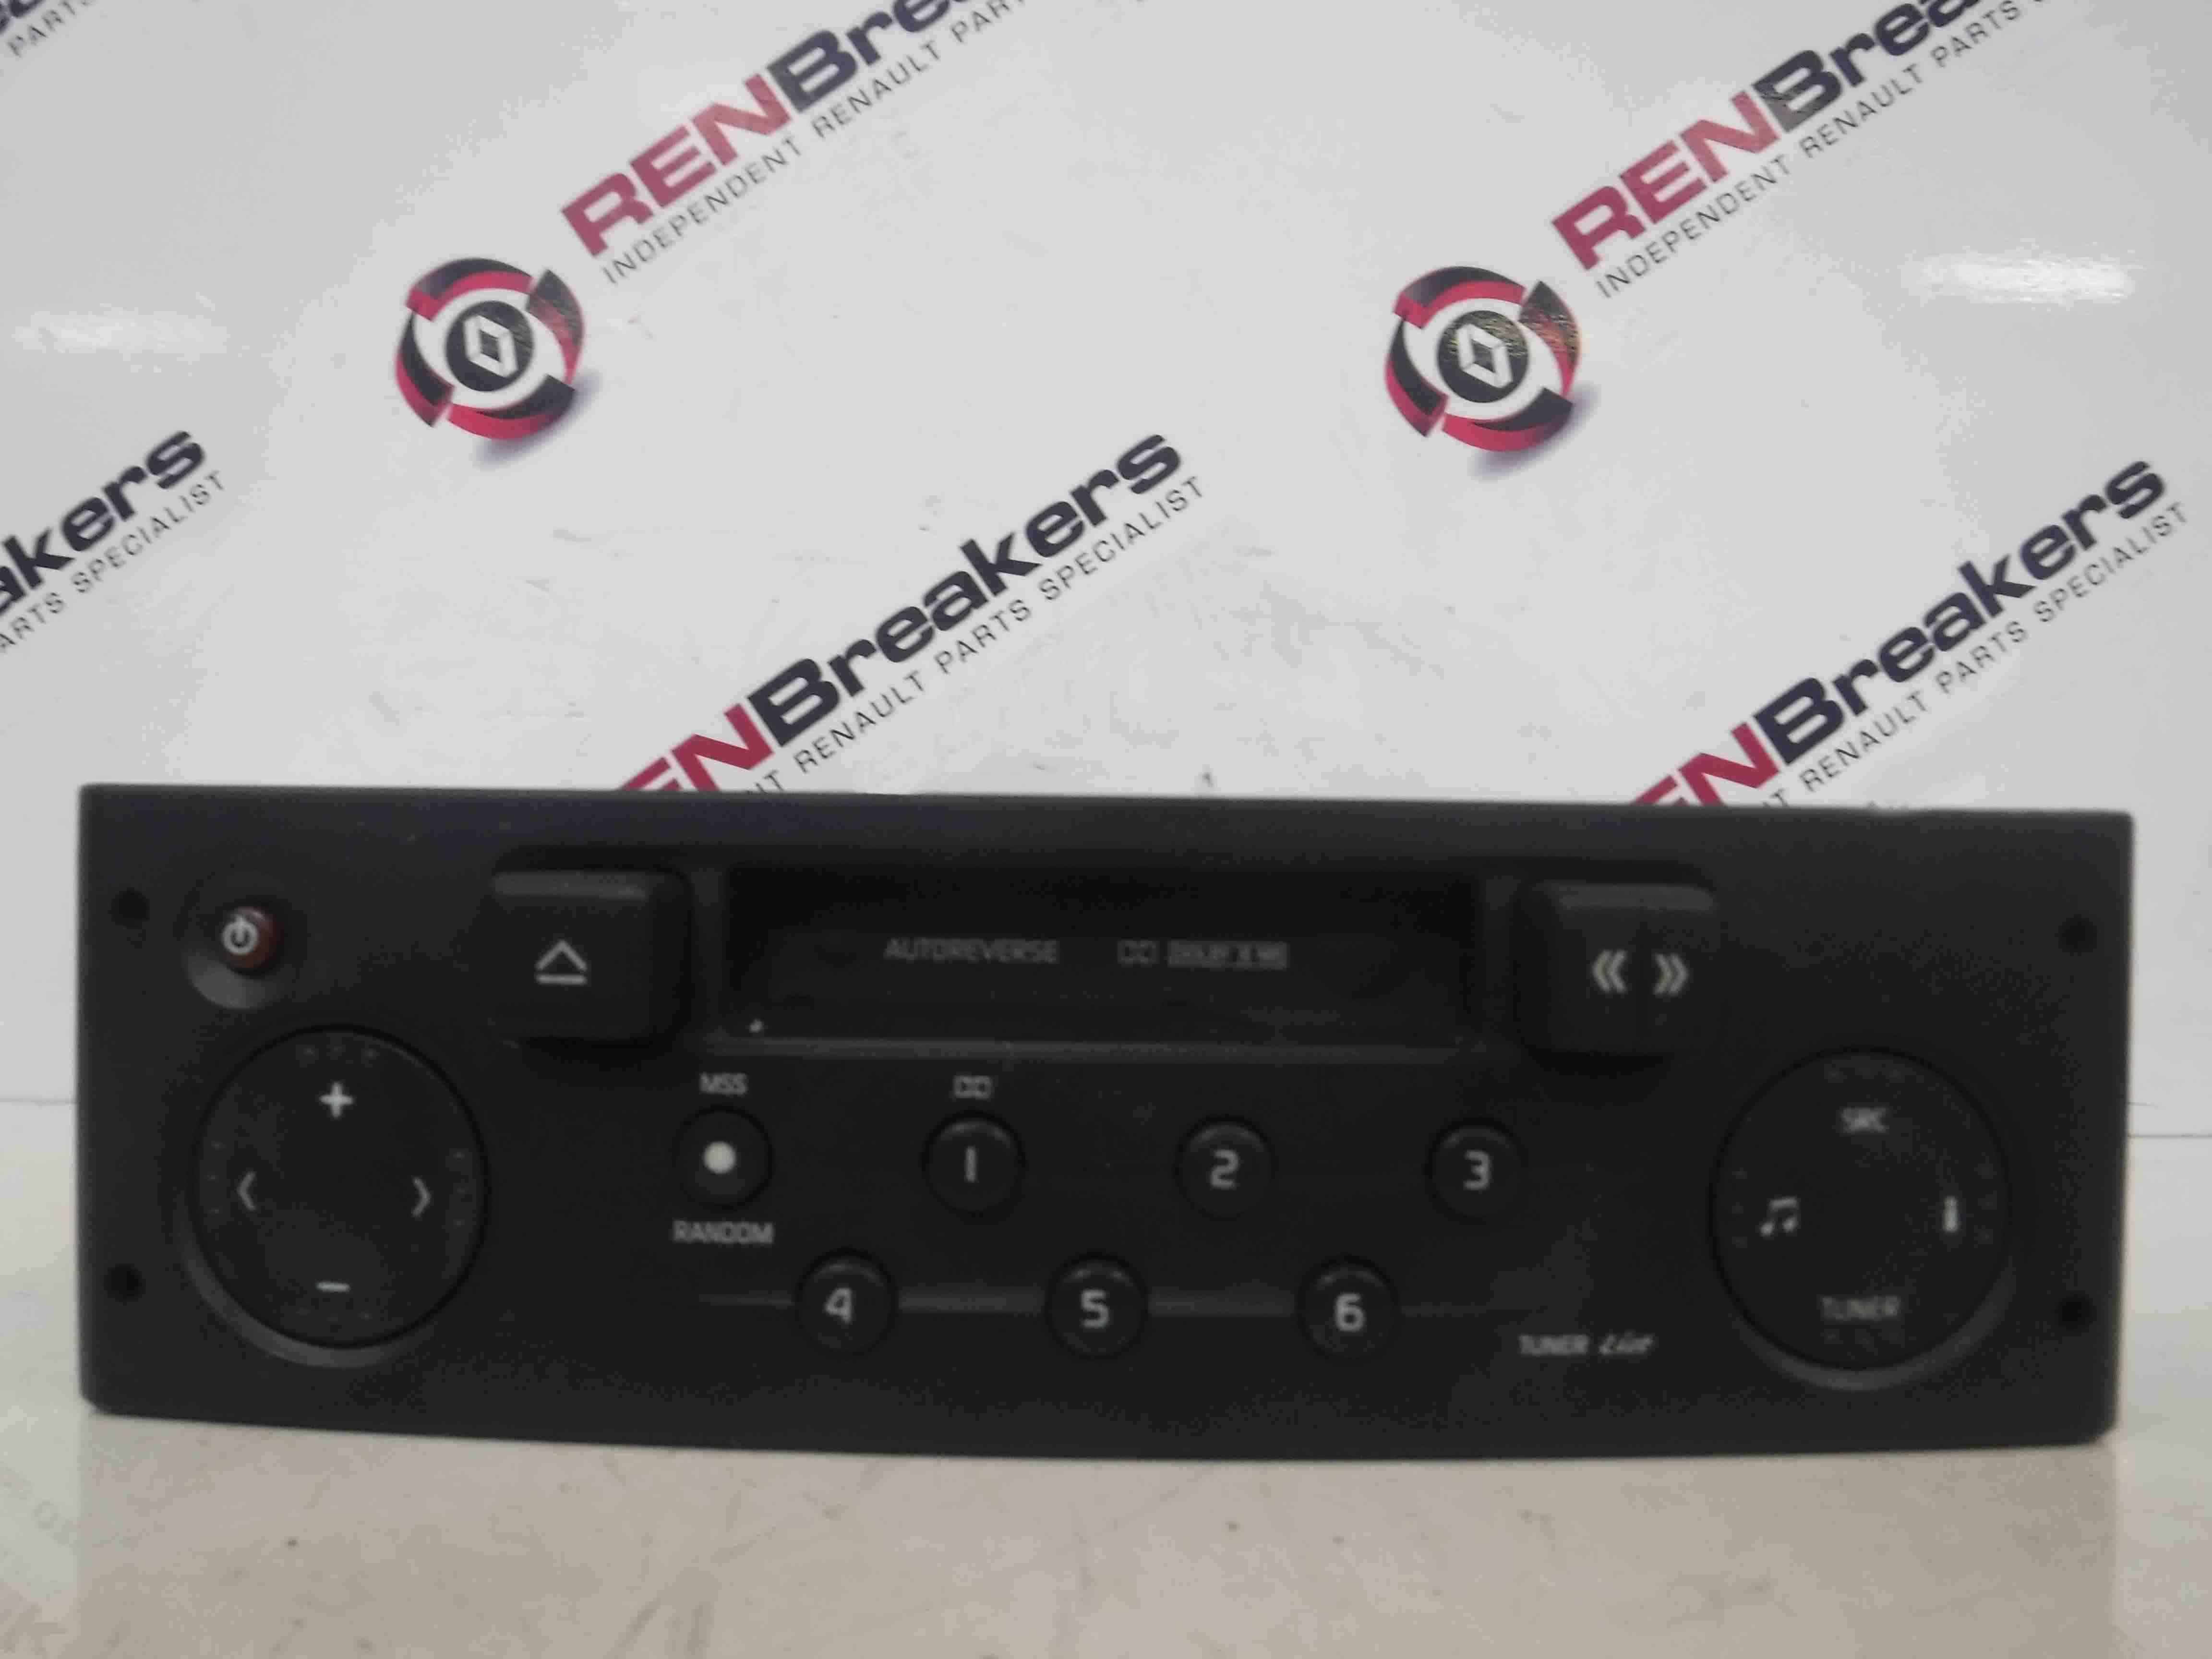 Renault Clio MK2 2001-2006 Radio Casette Player + Code 8200057673